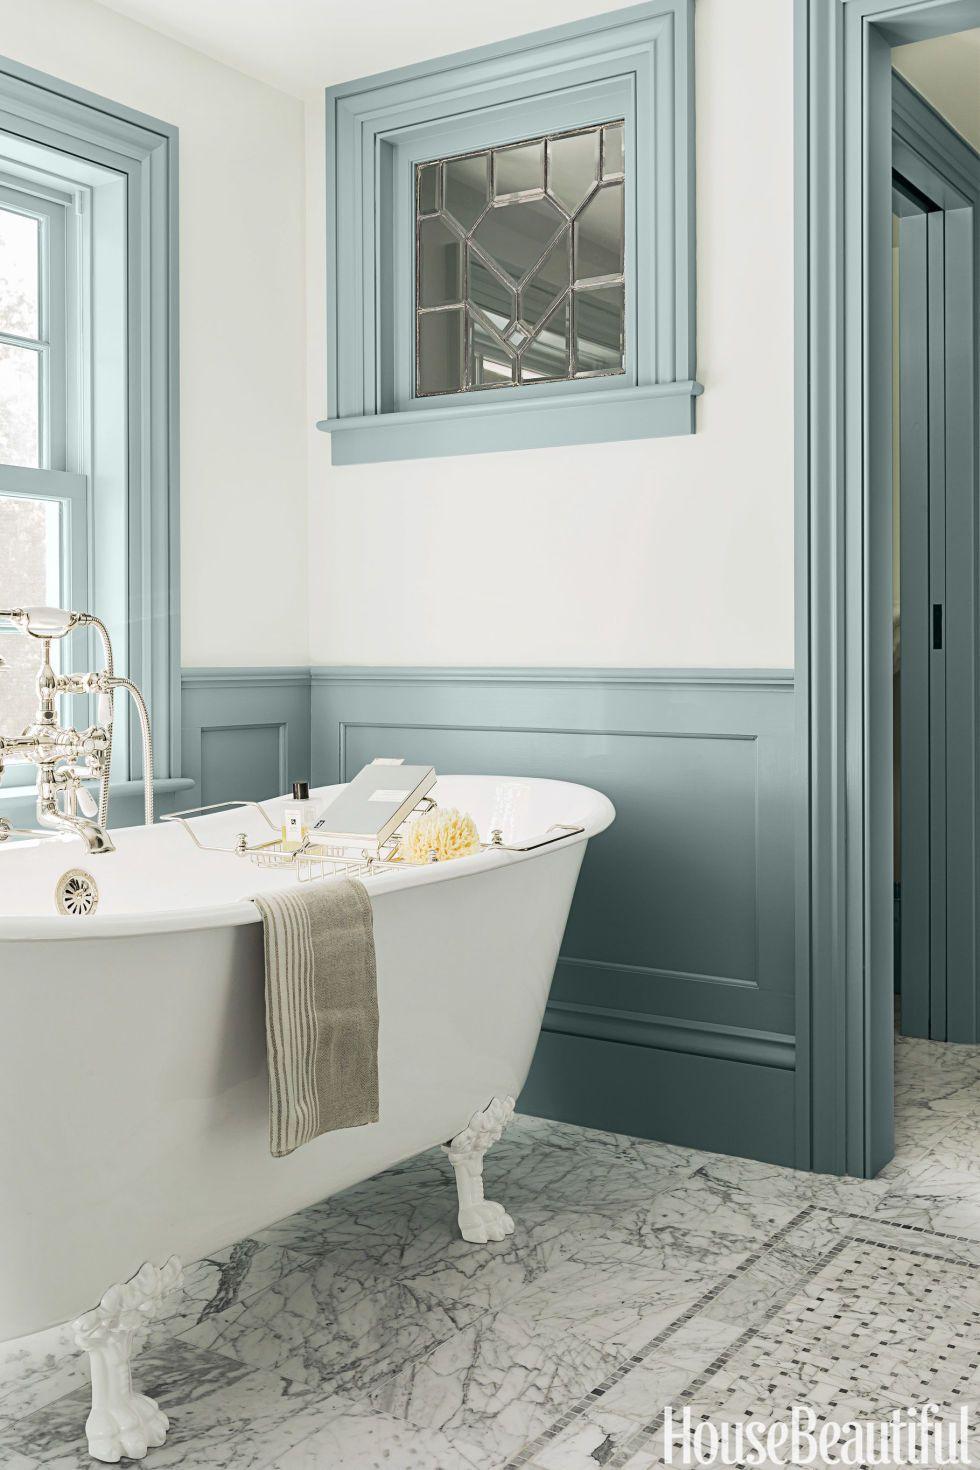 48 Eye-Catching Bathroom Tile Ideas   Tile ideas, Bathroom tiling ...